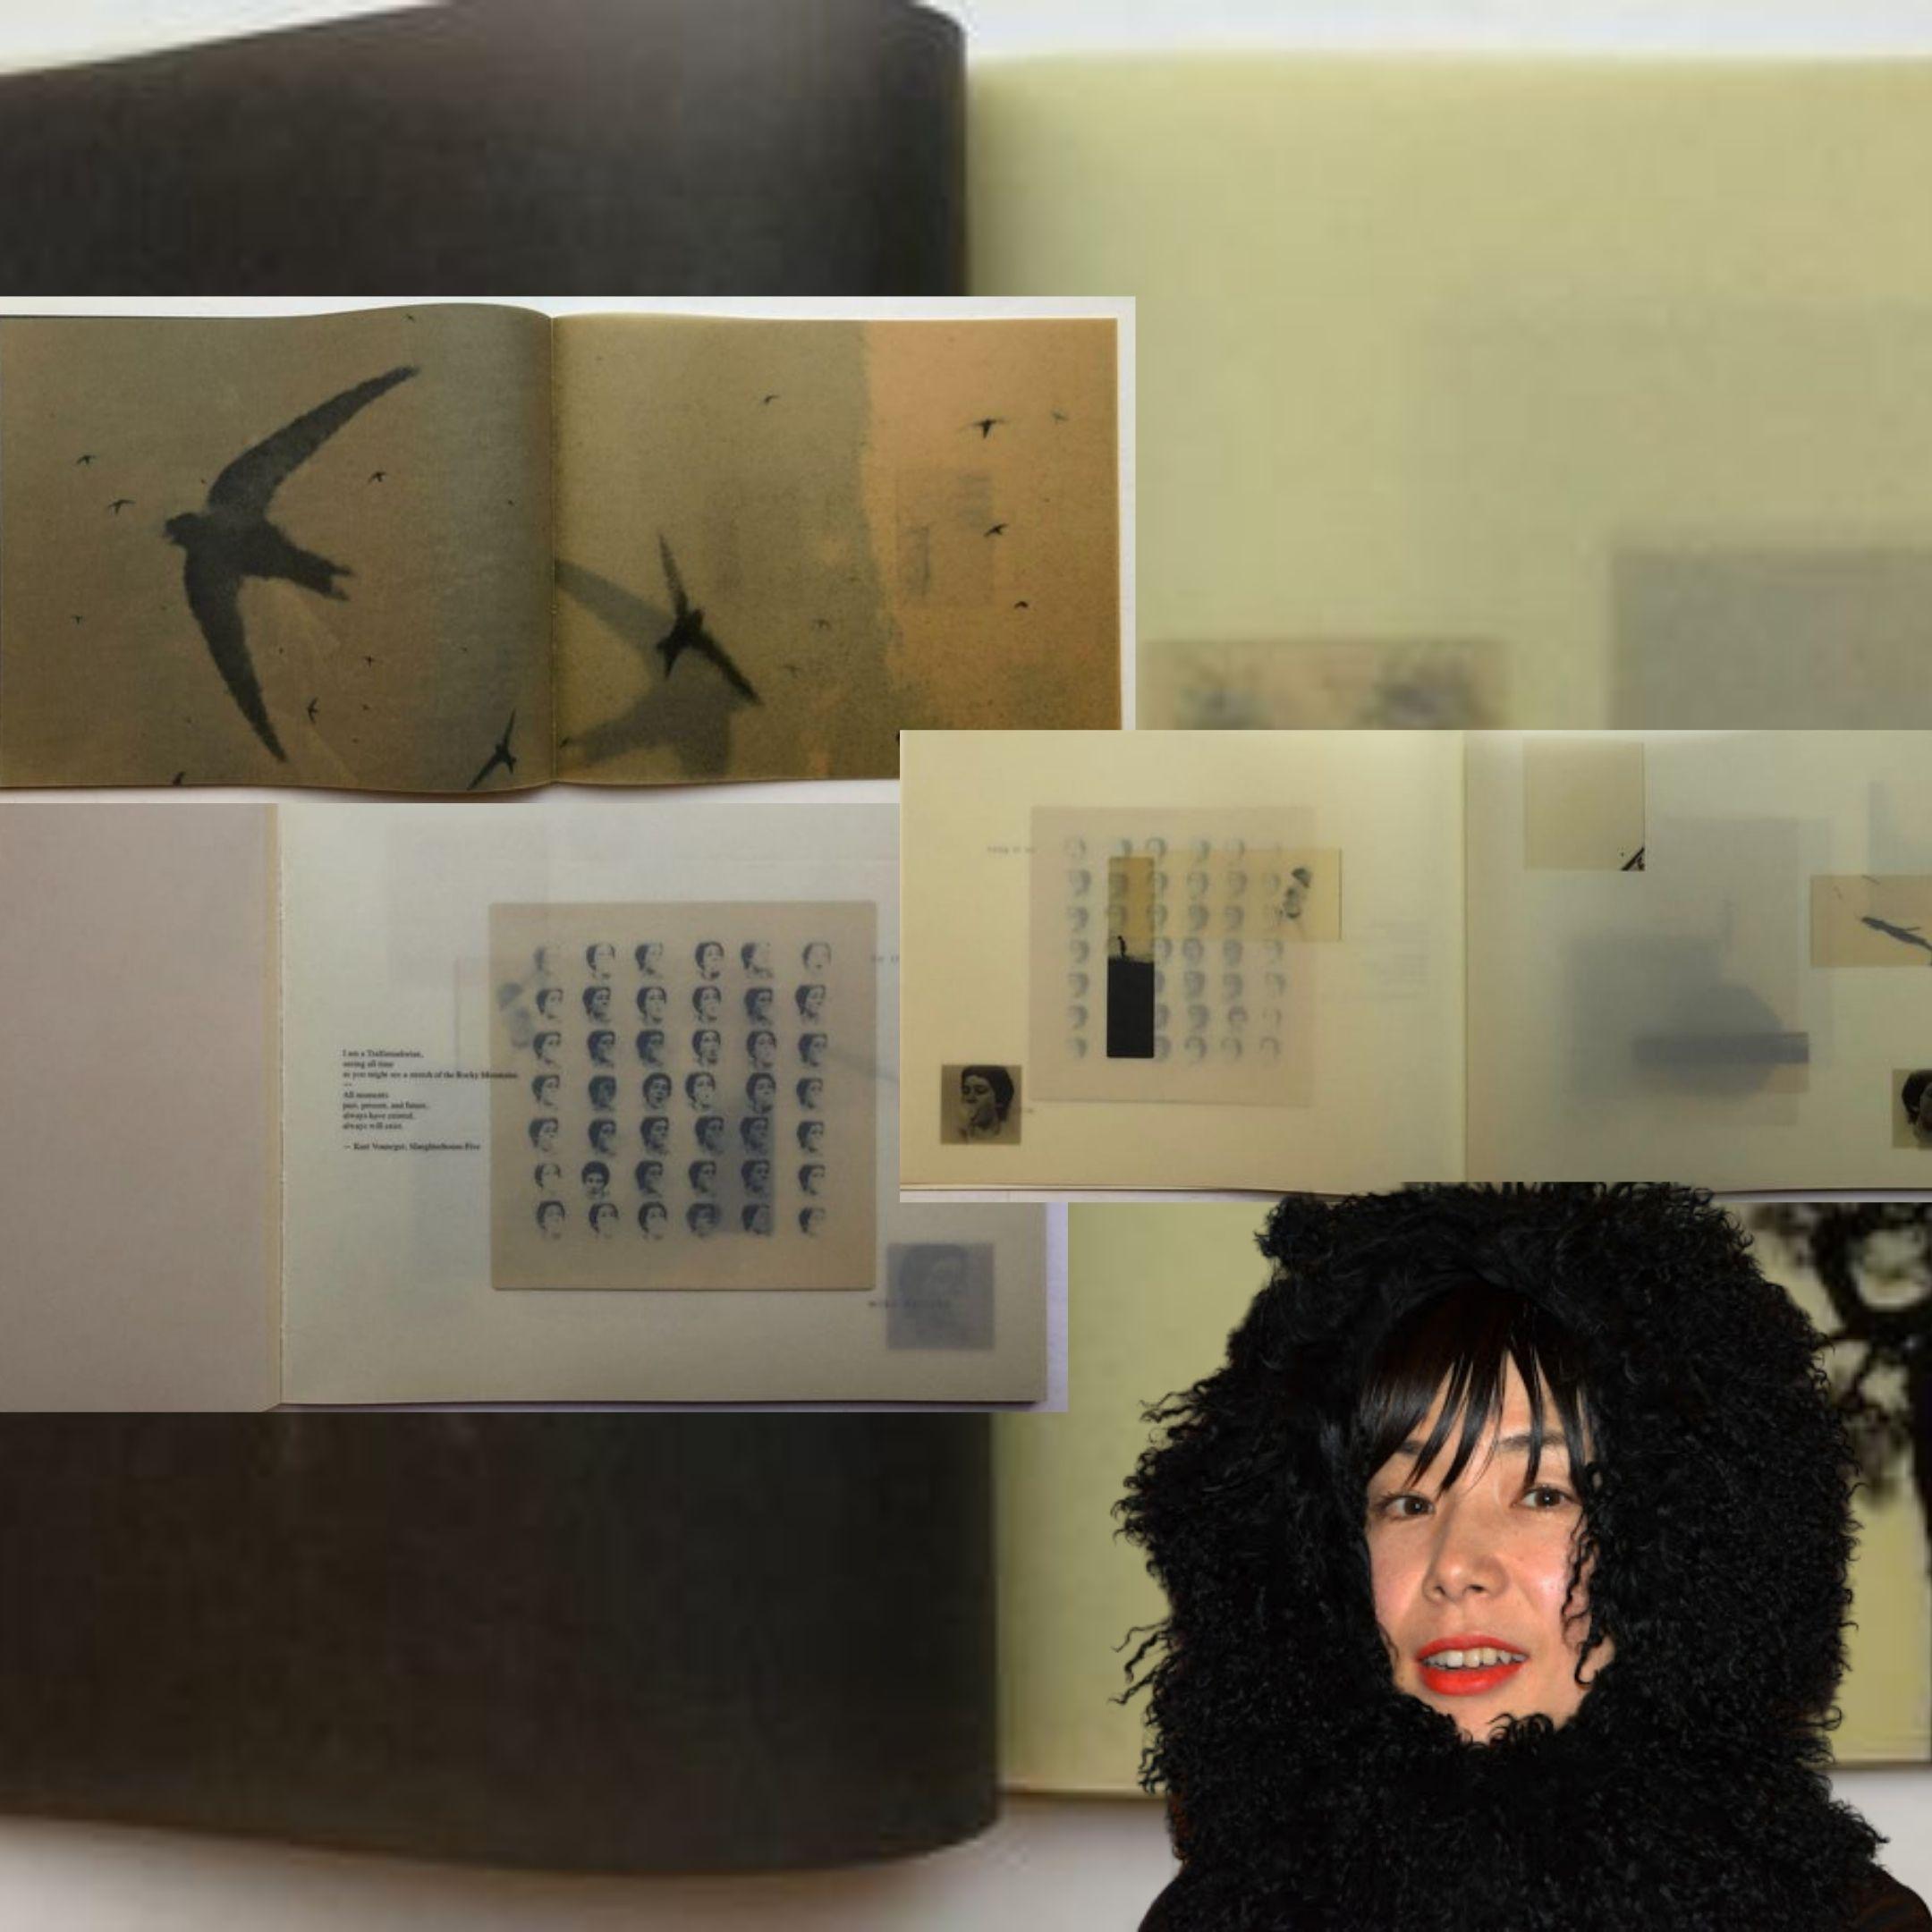 Uno straordinario concept book fotografico di Miho Kajioka: So it goes (2019) in asta sottocosto